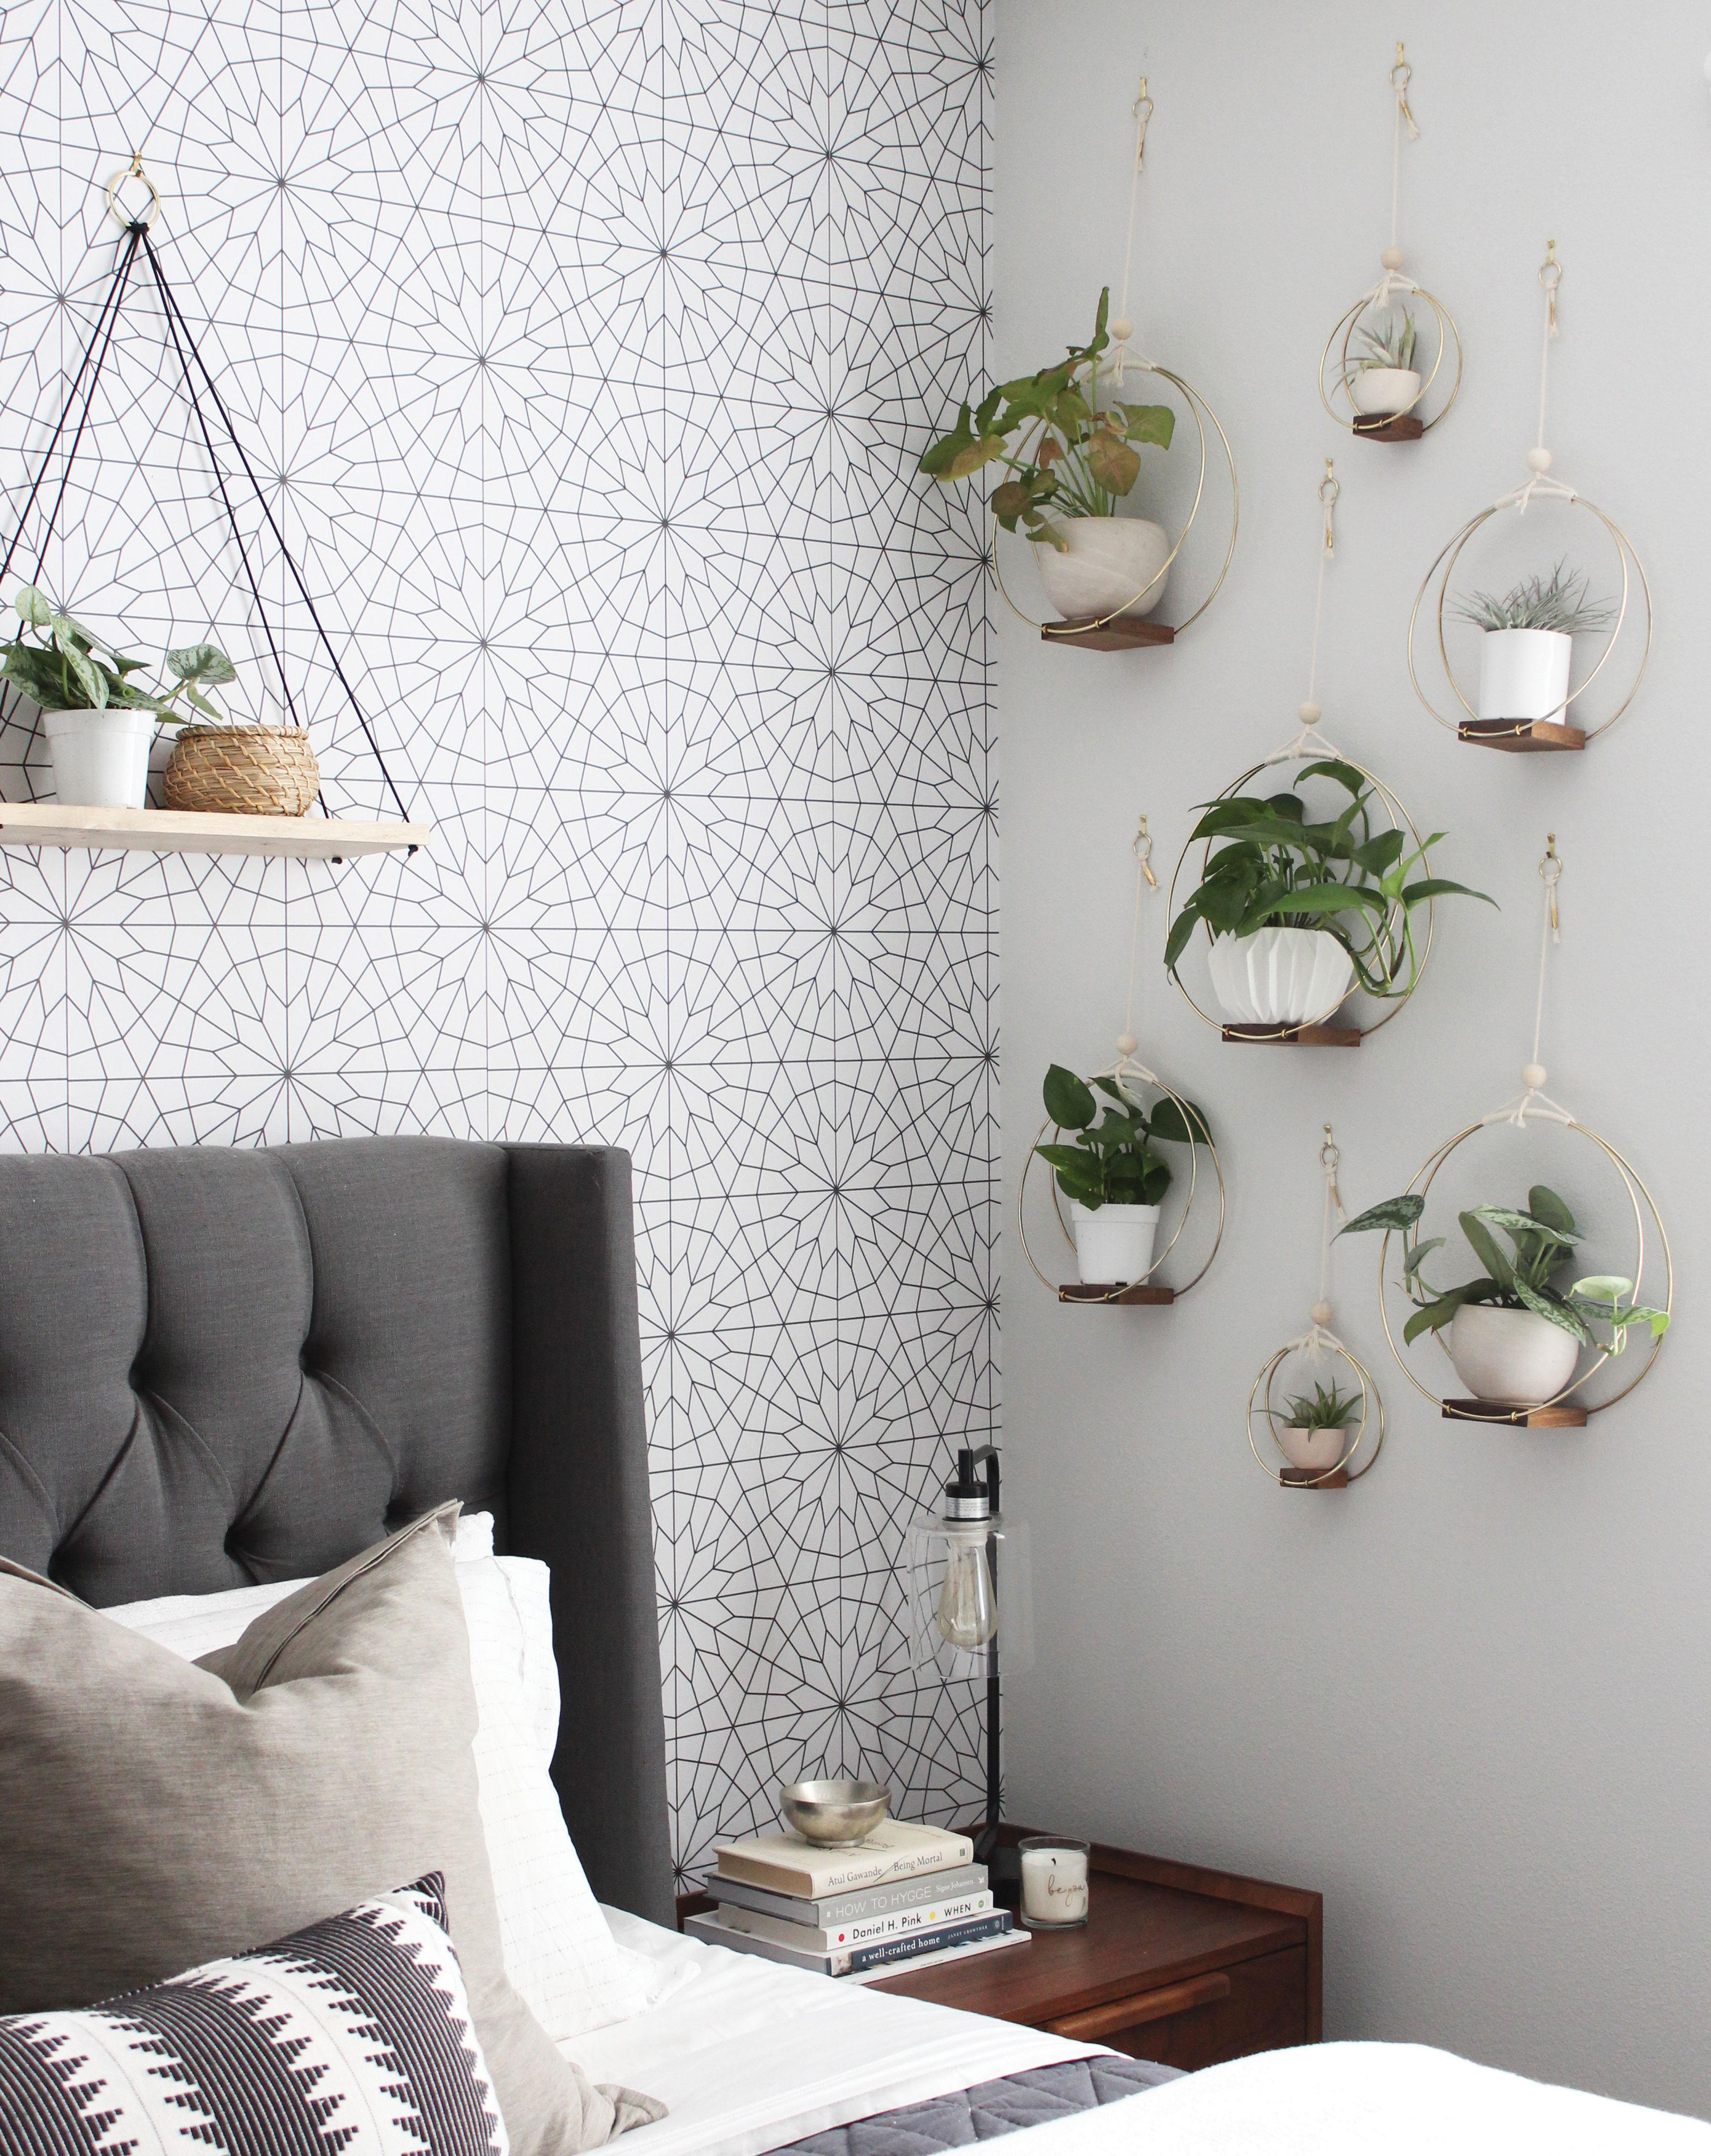 house plants air plants wall display